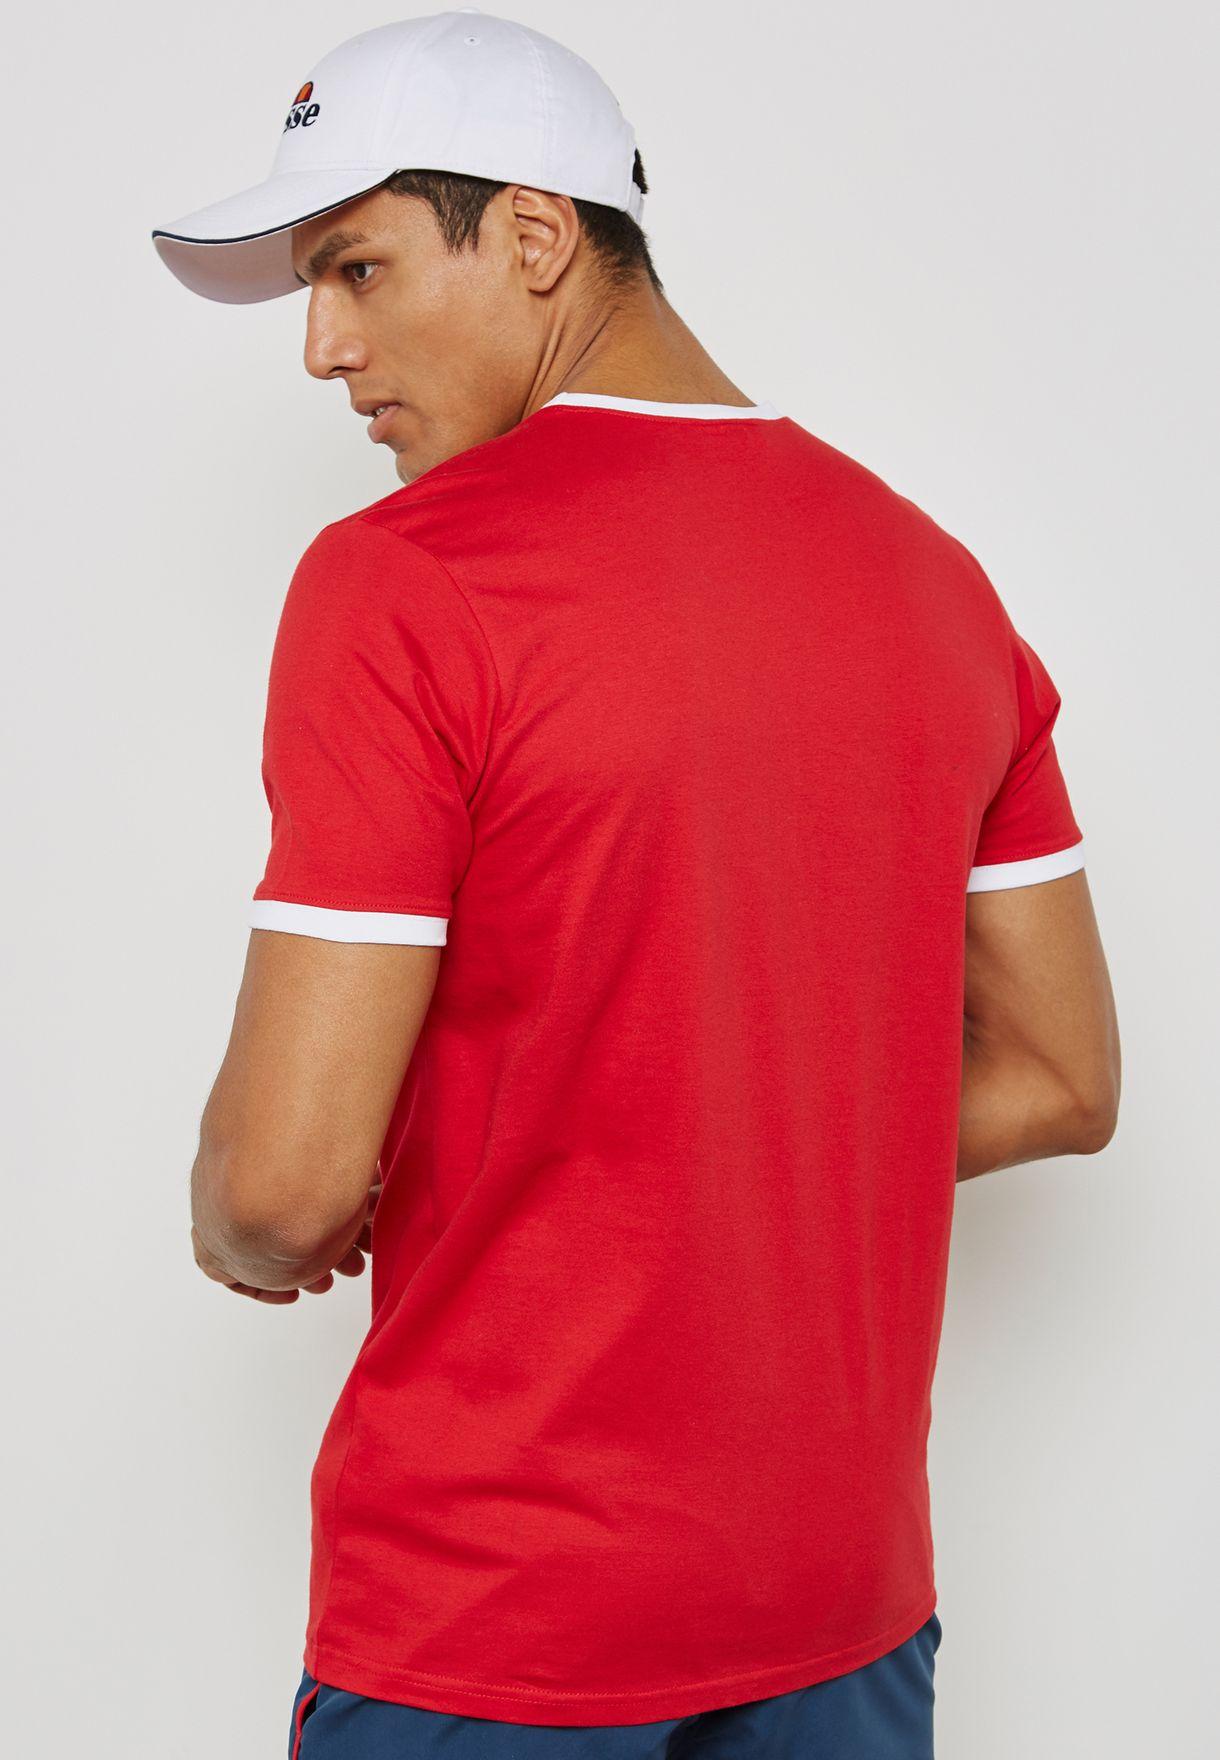 d8fdc6c5 Agrigento T-Shirt